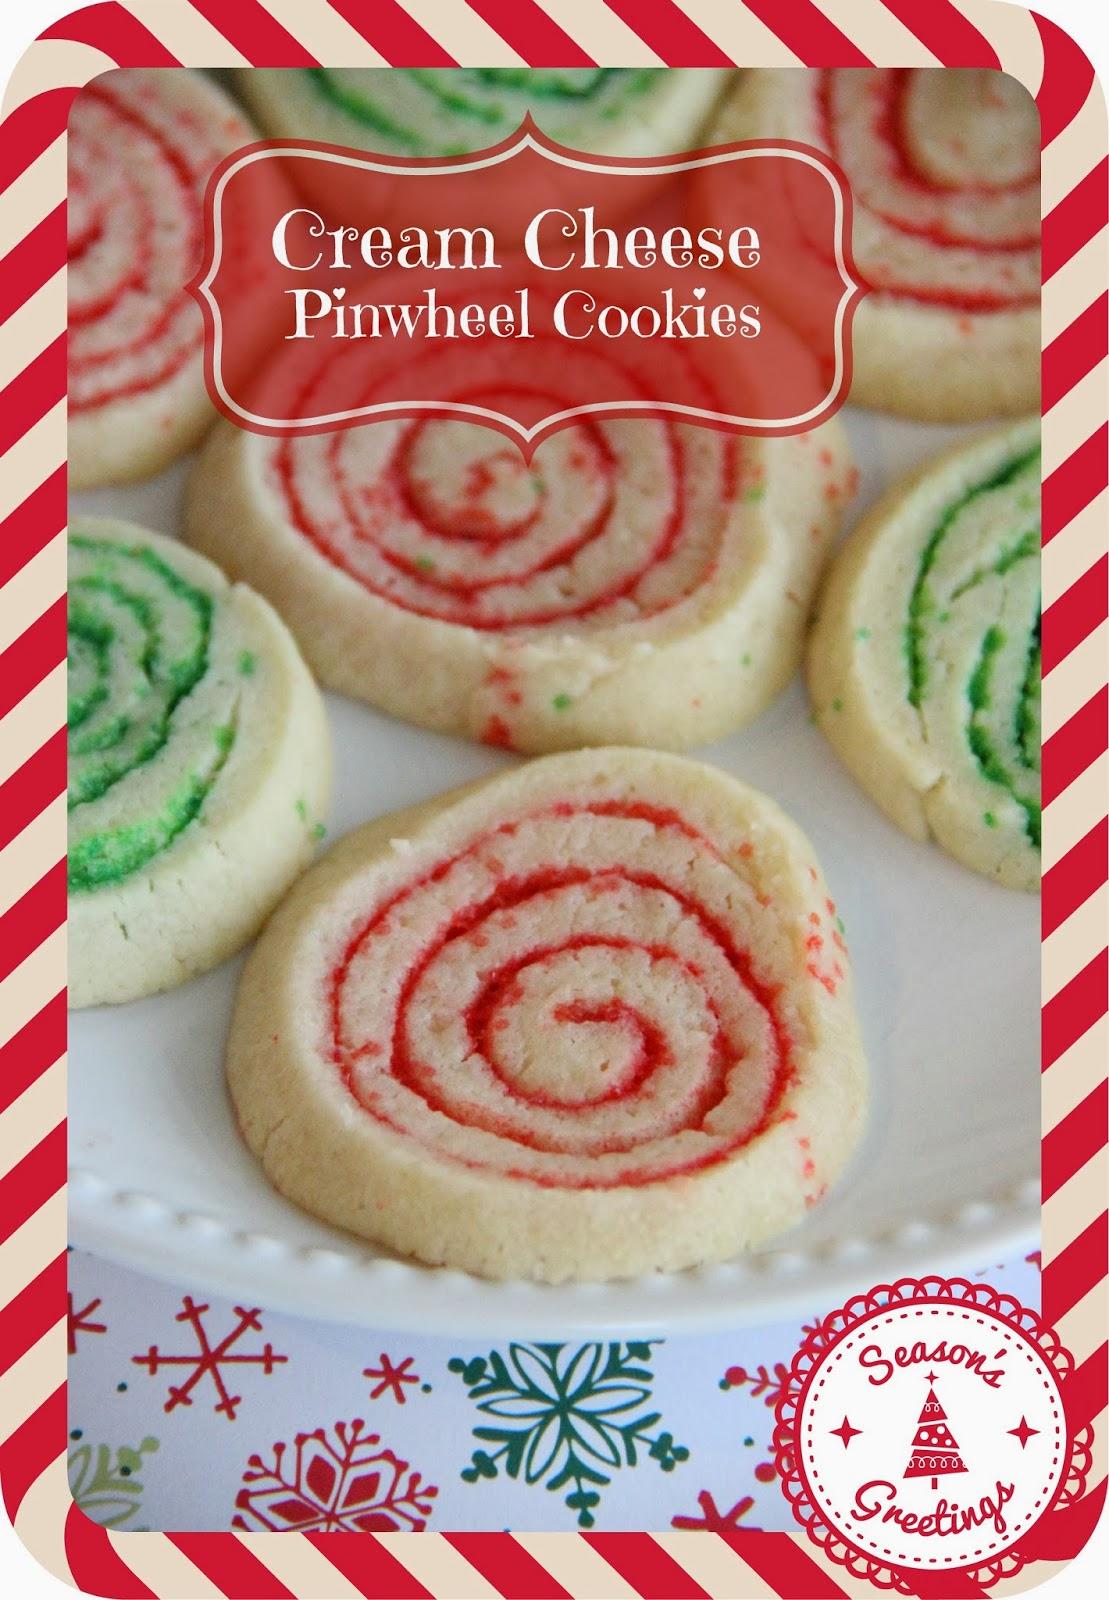 Christmas Pinwheel Cookies.Cream Cheese Christmas Pinwheel Cookies Diary Of A Recipe